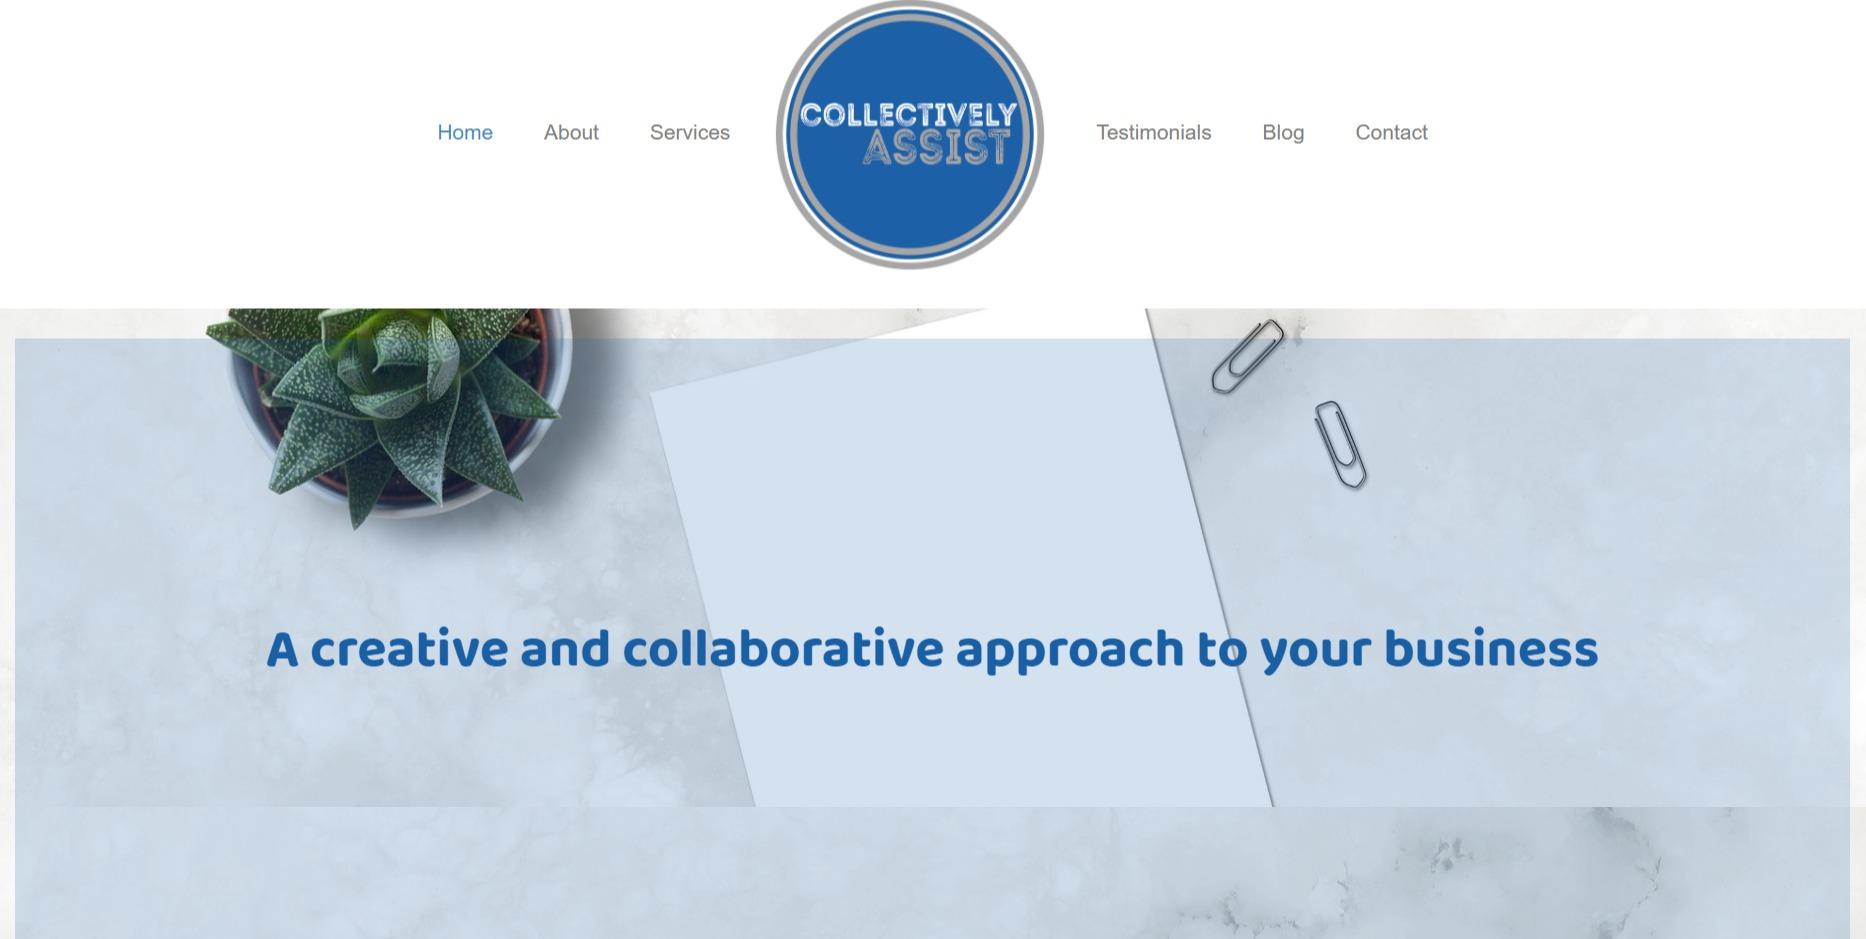 portfolio pic of new website desktop and paper clips